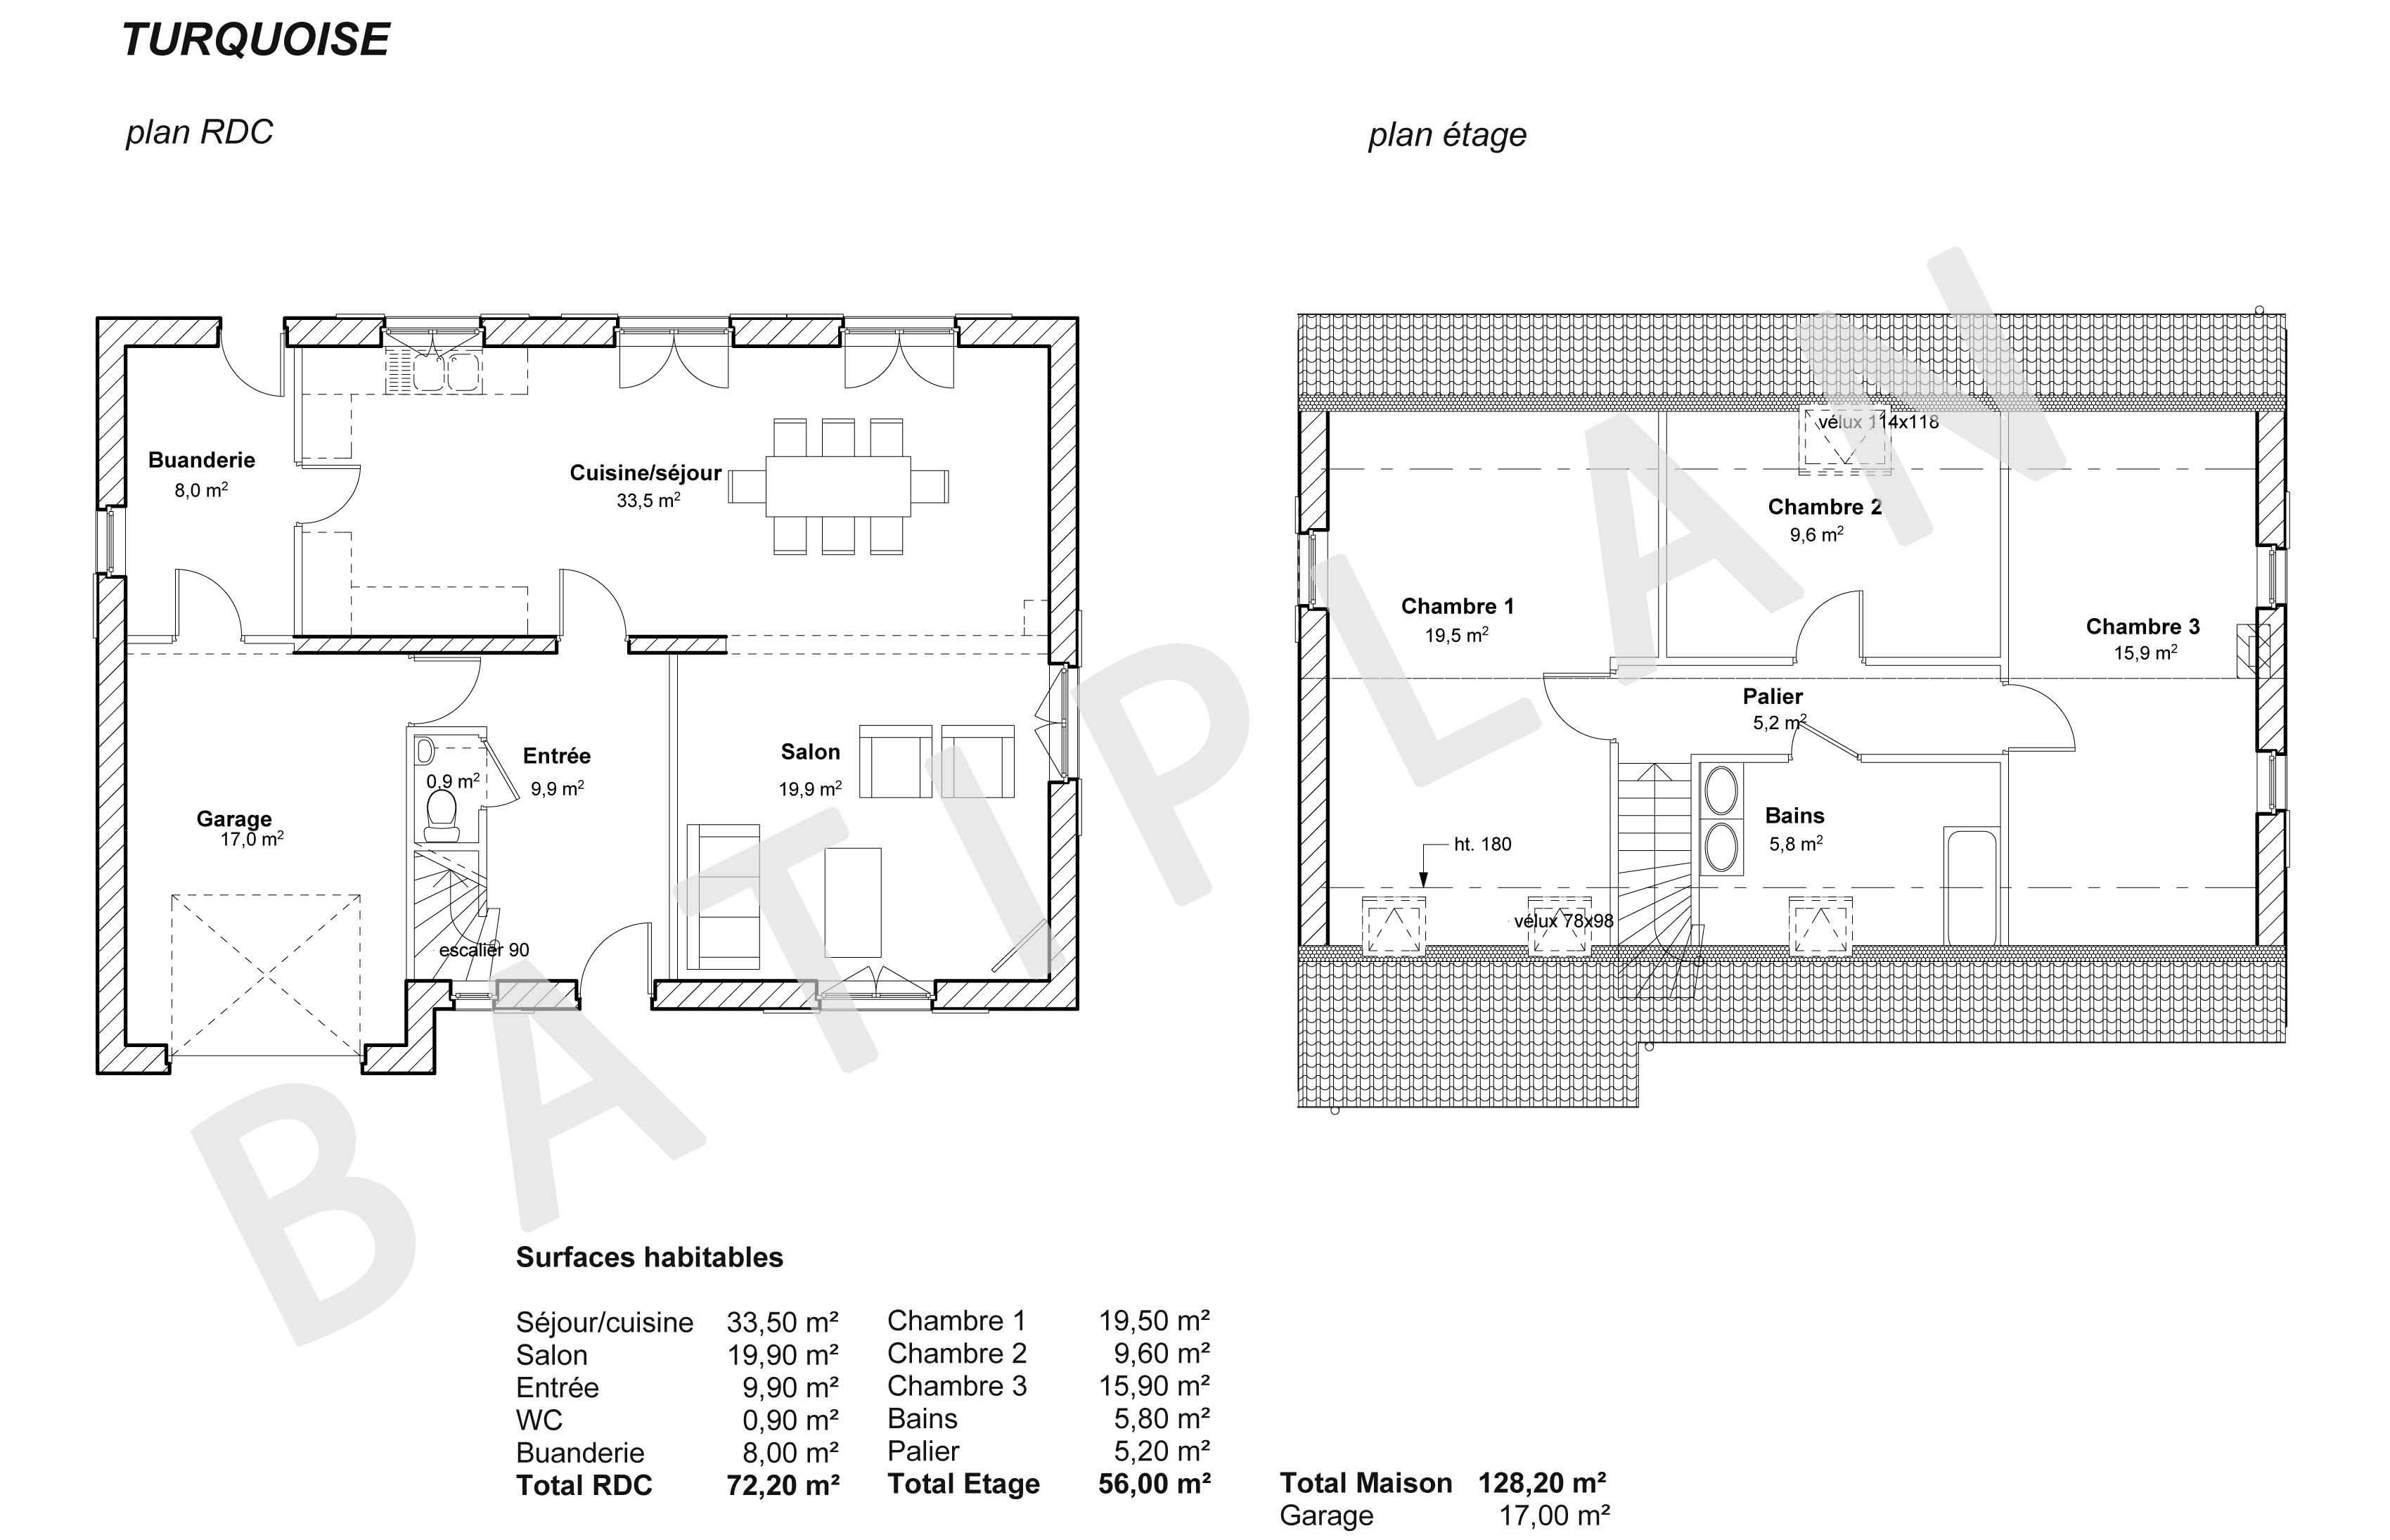 Plan Maison Turquoise